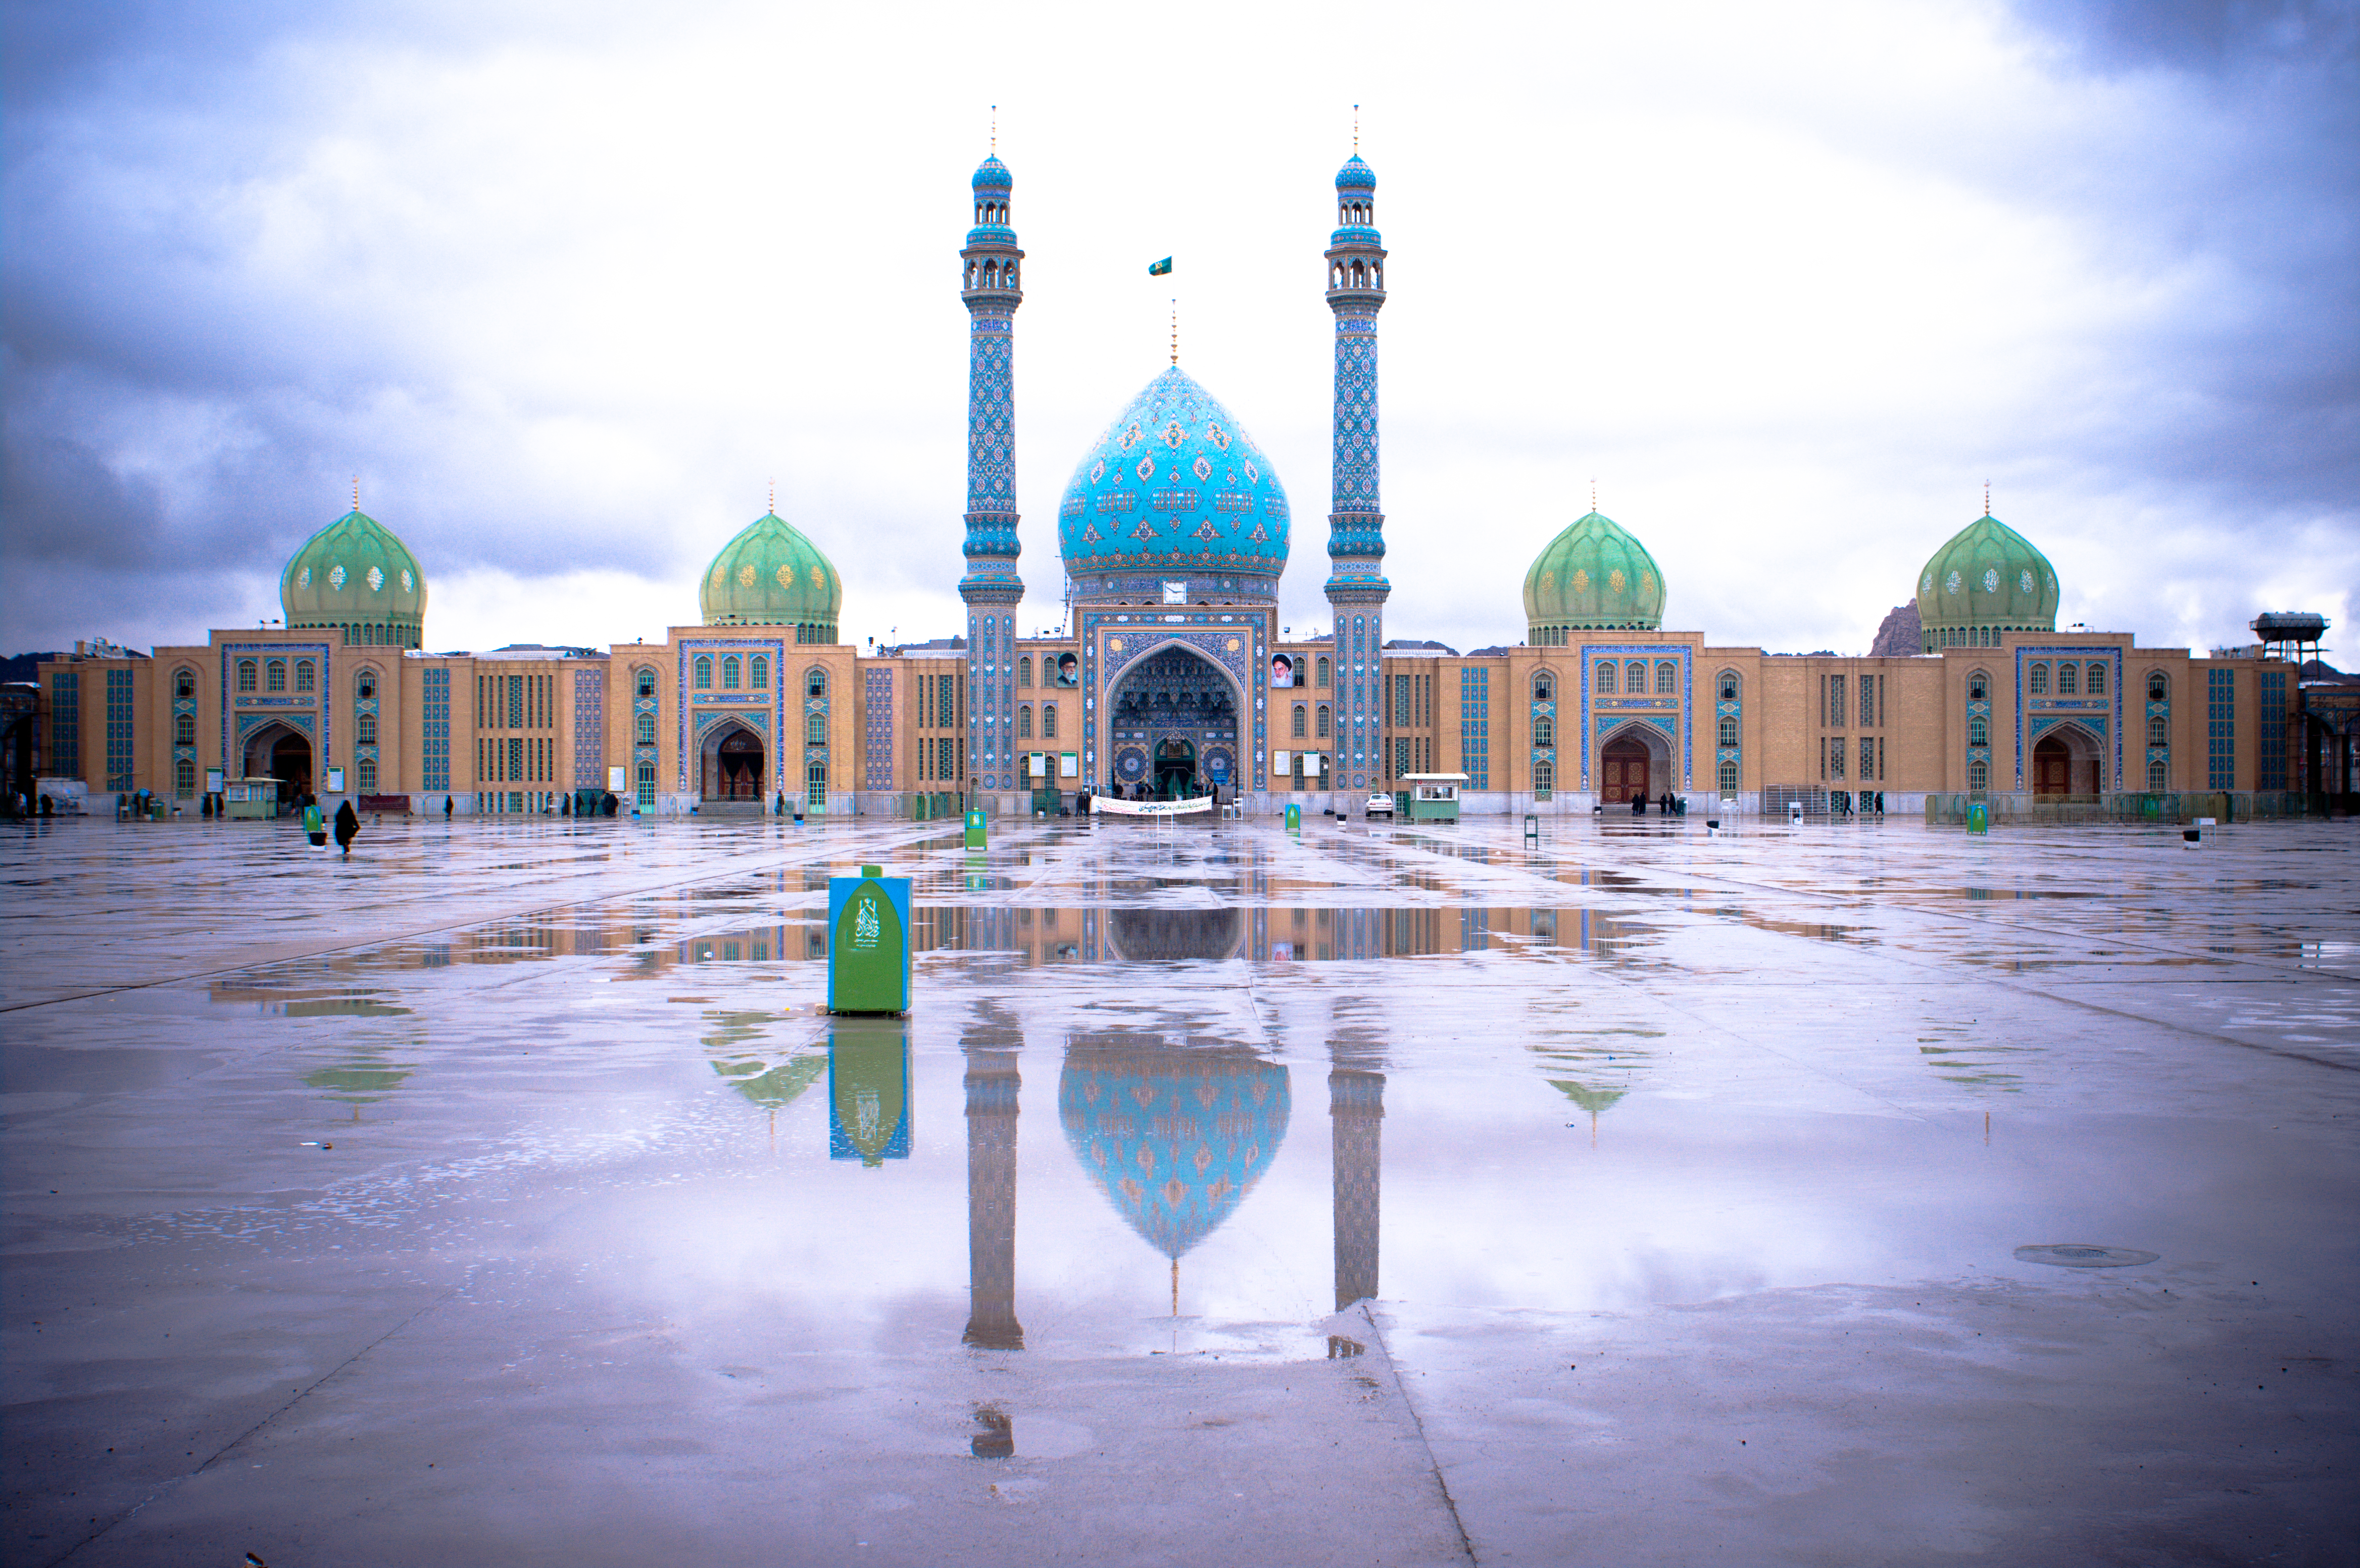 https://upload.wikimedia.org/wikipedia/commons/f/f0/Jamkaran_Mosque-3855.jpg